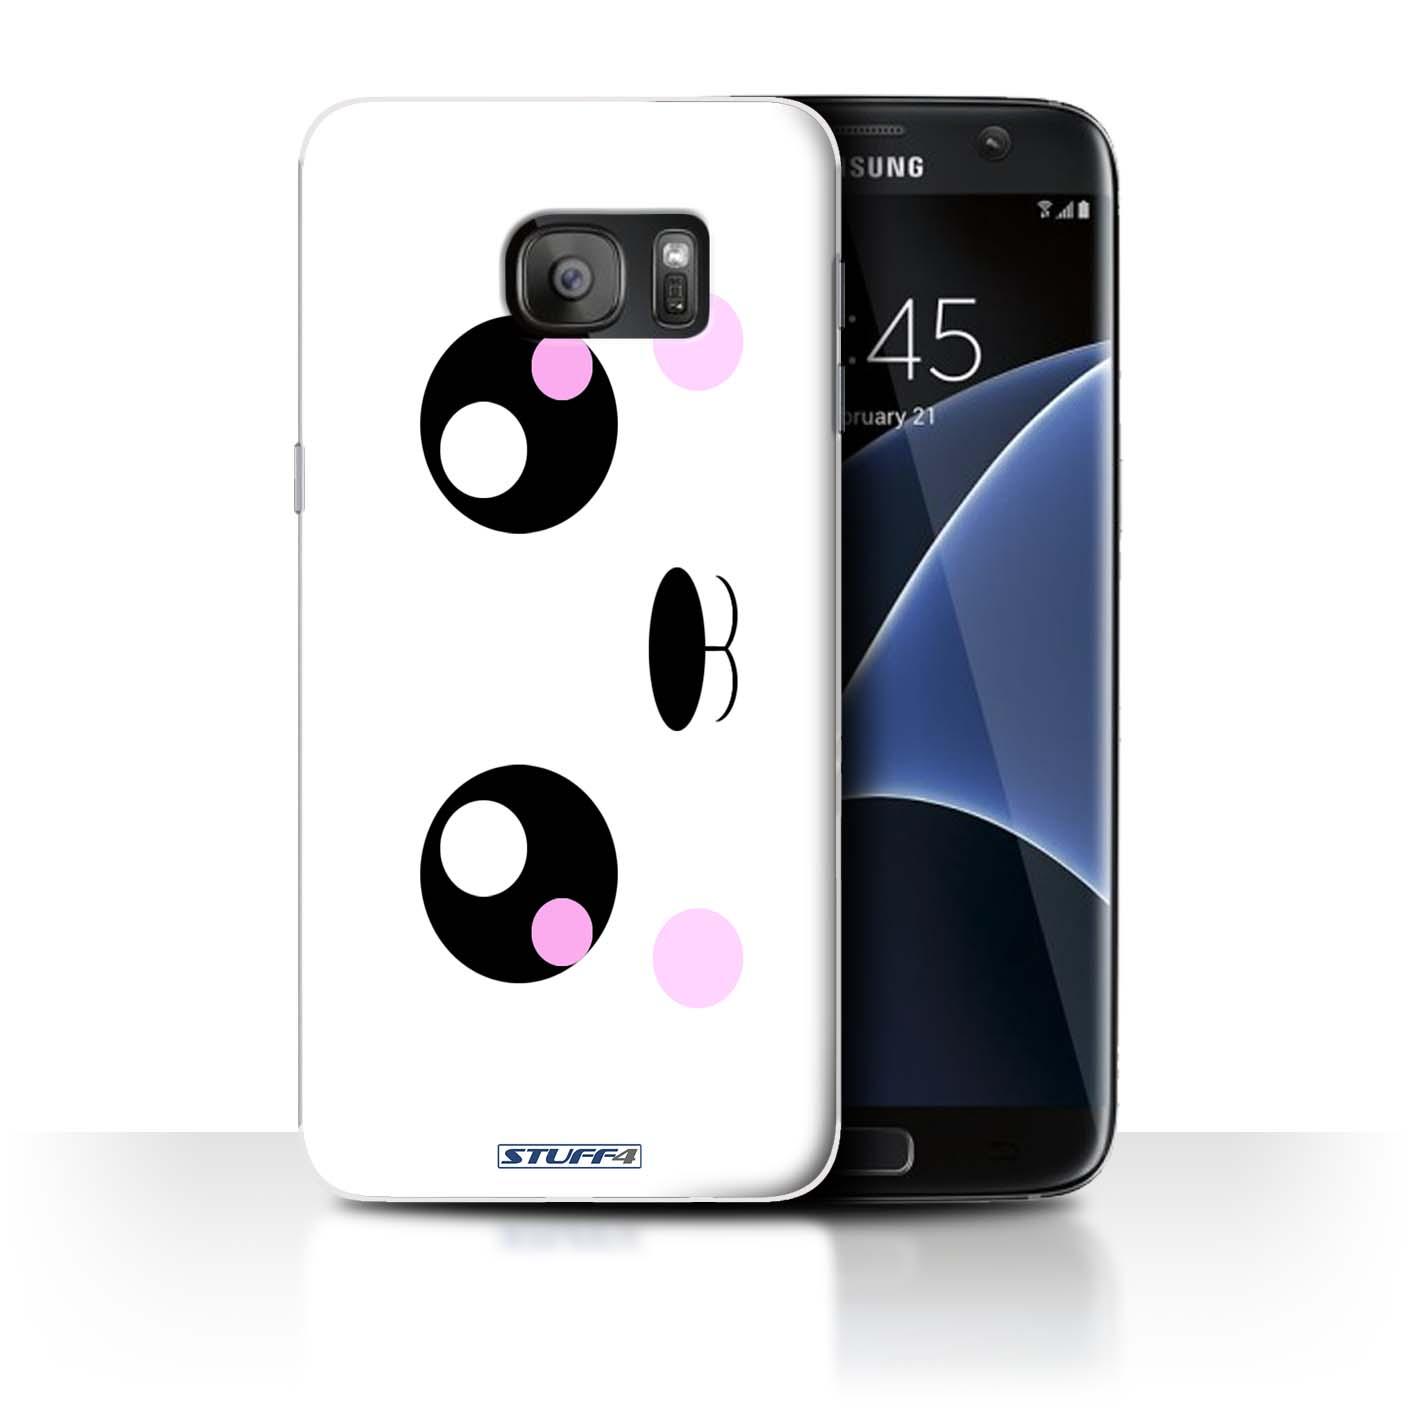 online store e9d11 186b2 Protective Hard Back Case for Samsung Galaxy S7 Edge/G935 / Cute Kawaii  Collection / Panda